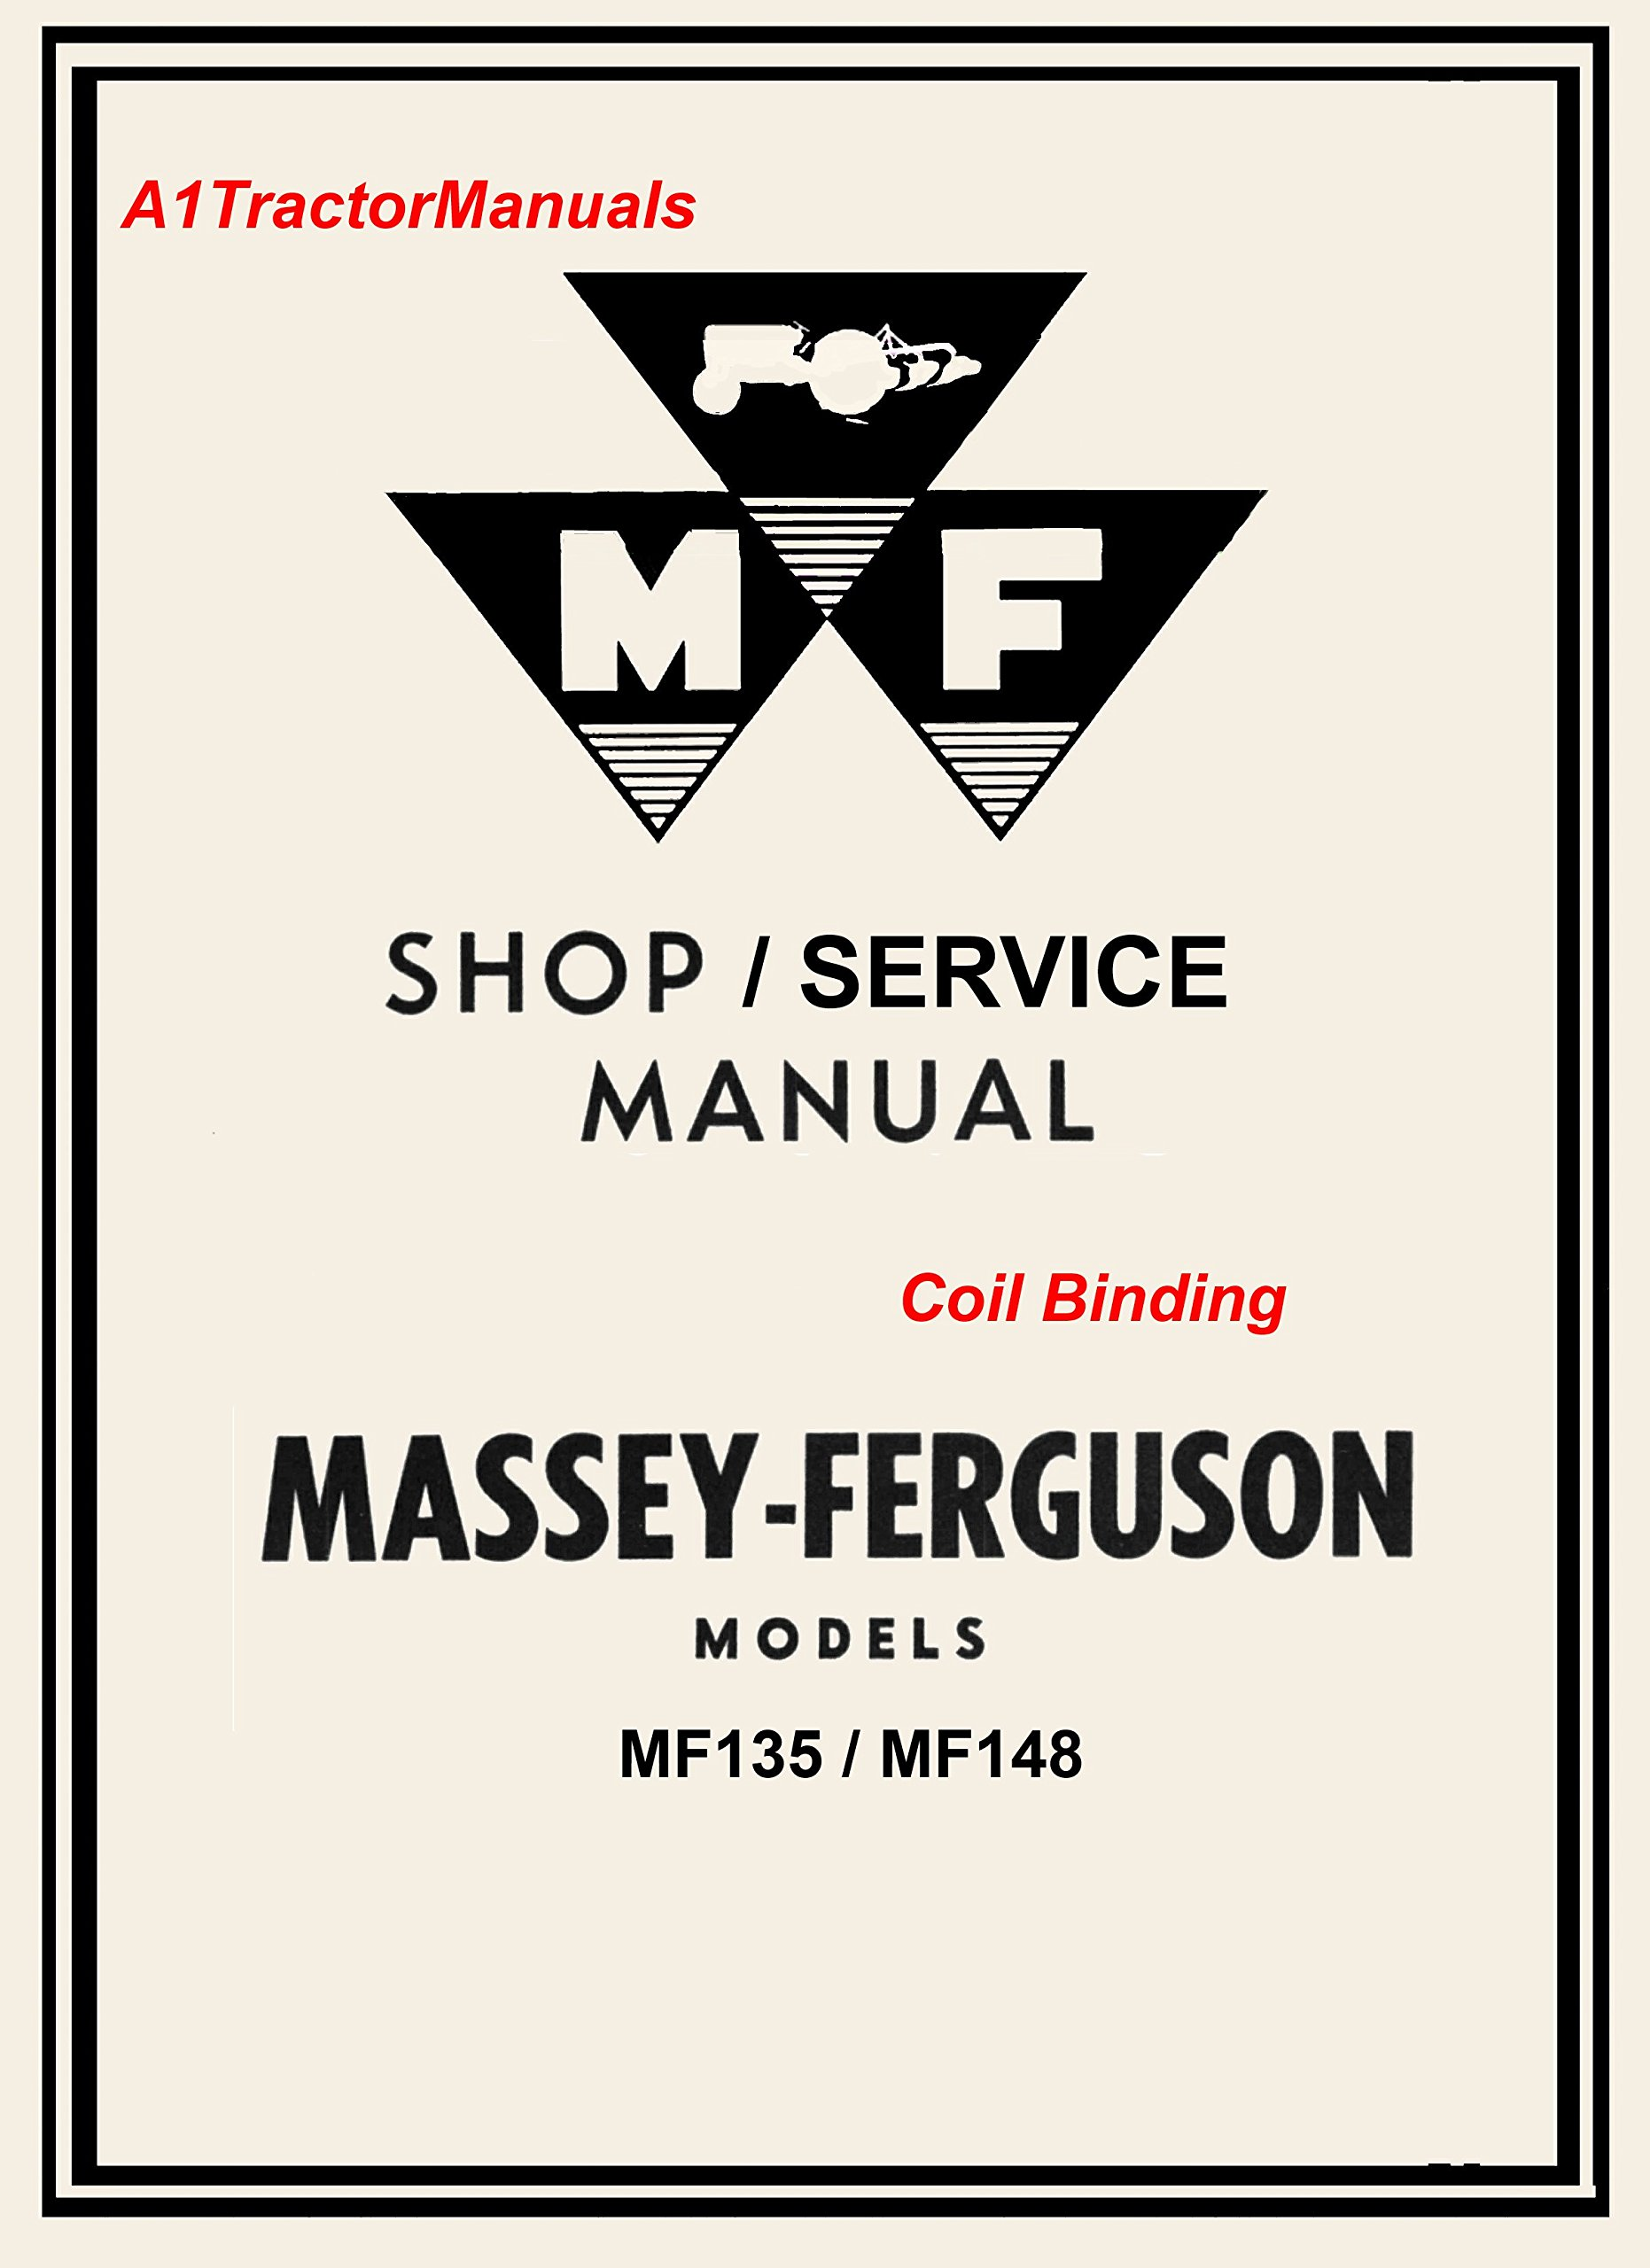 Massey Ferguson Mf135 Mf148 Shop/service Manual: Massey Ferguson:  0763616419764: Amazon.com: Books